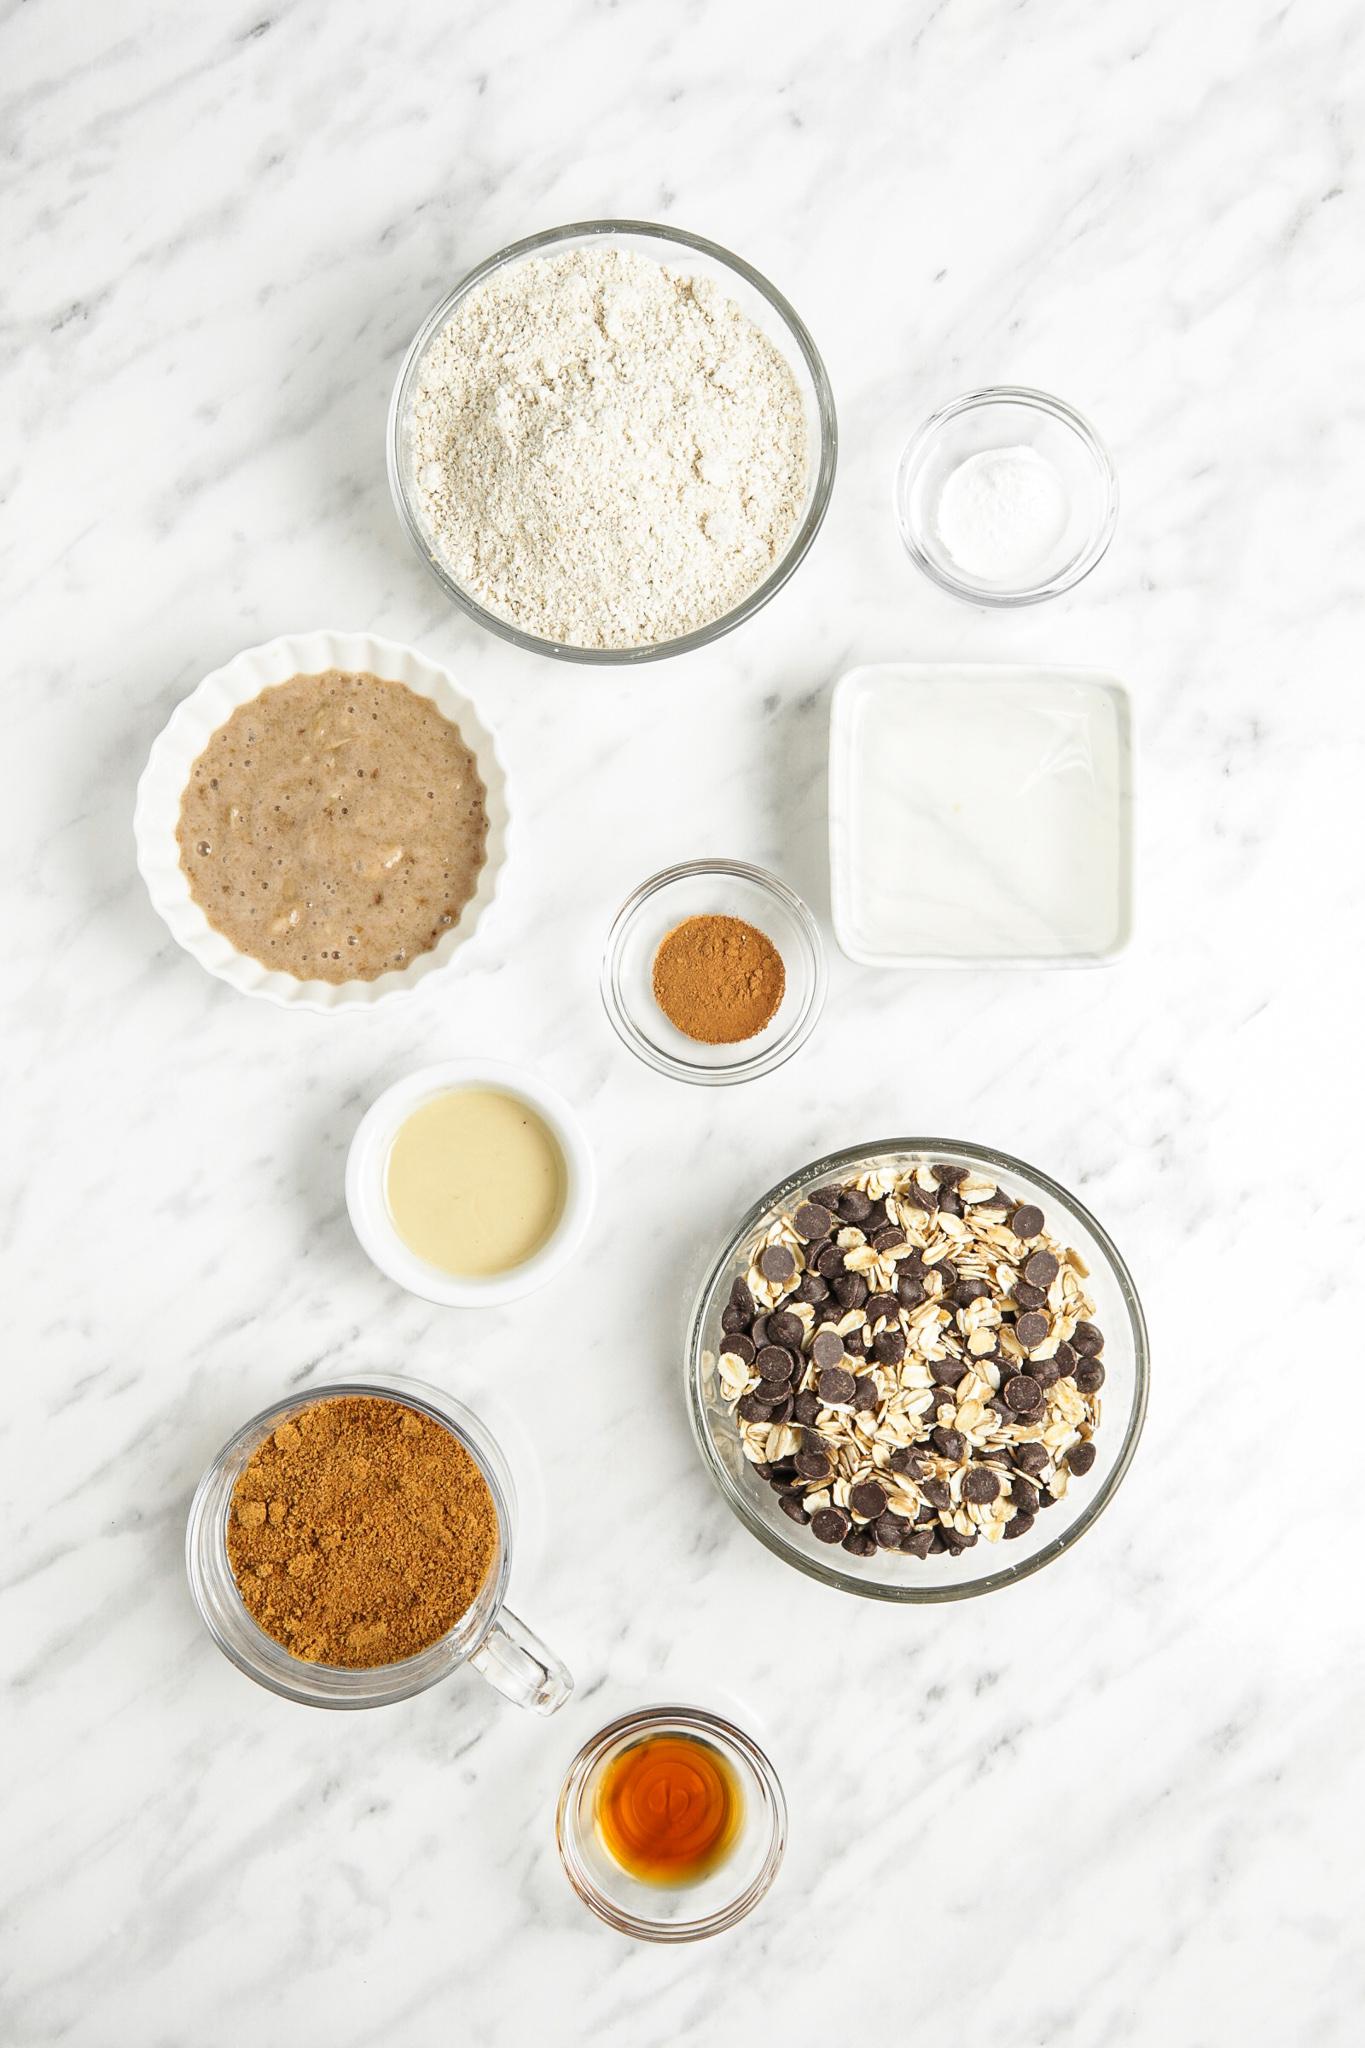 Homemade Banana Oatmeal Cookies ingredients.